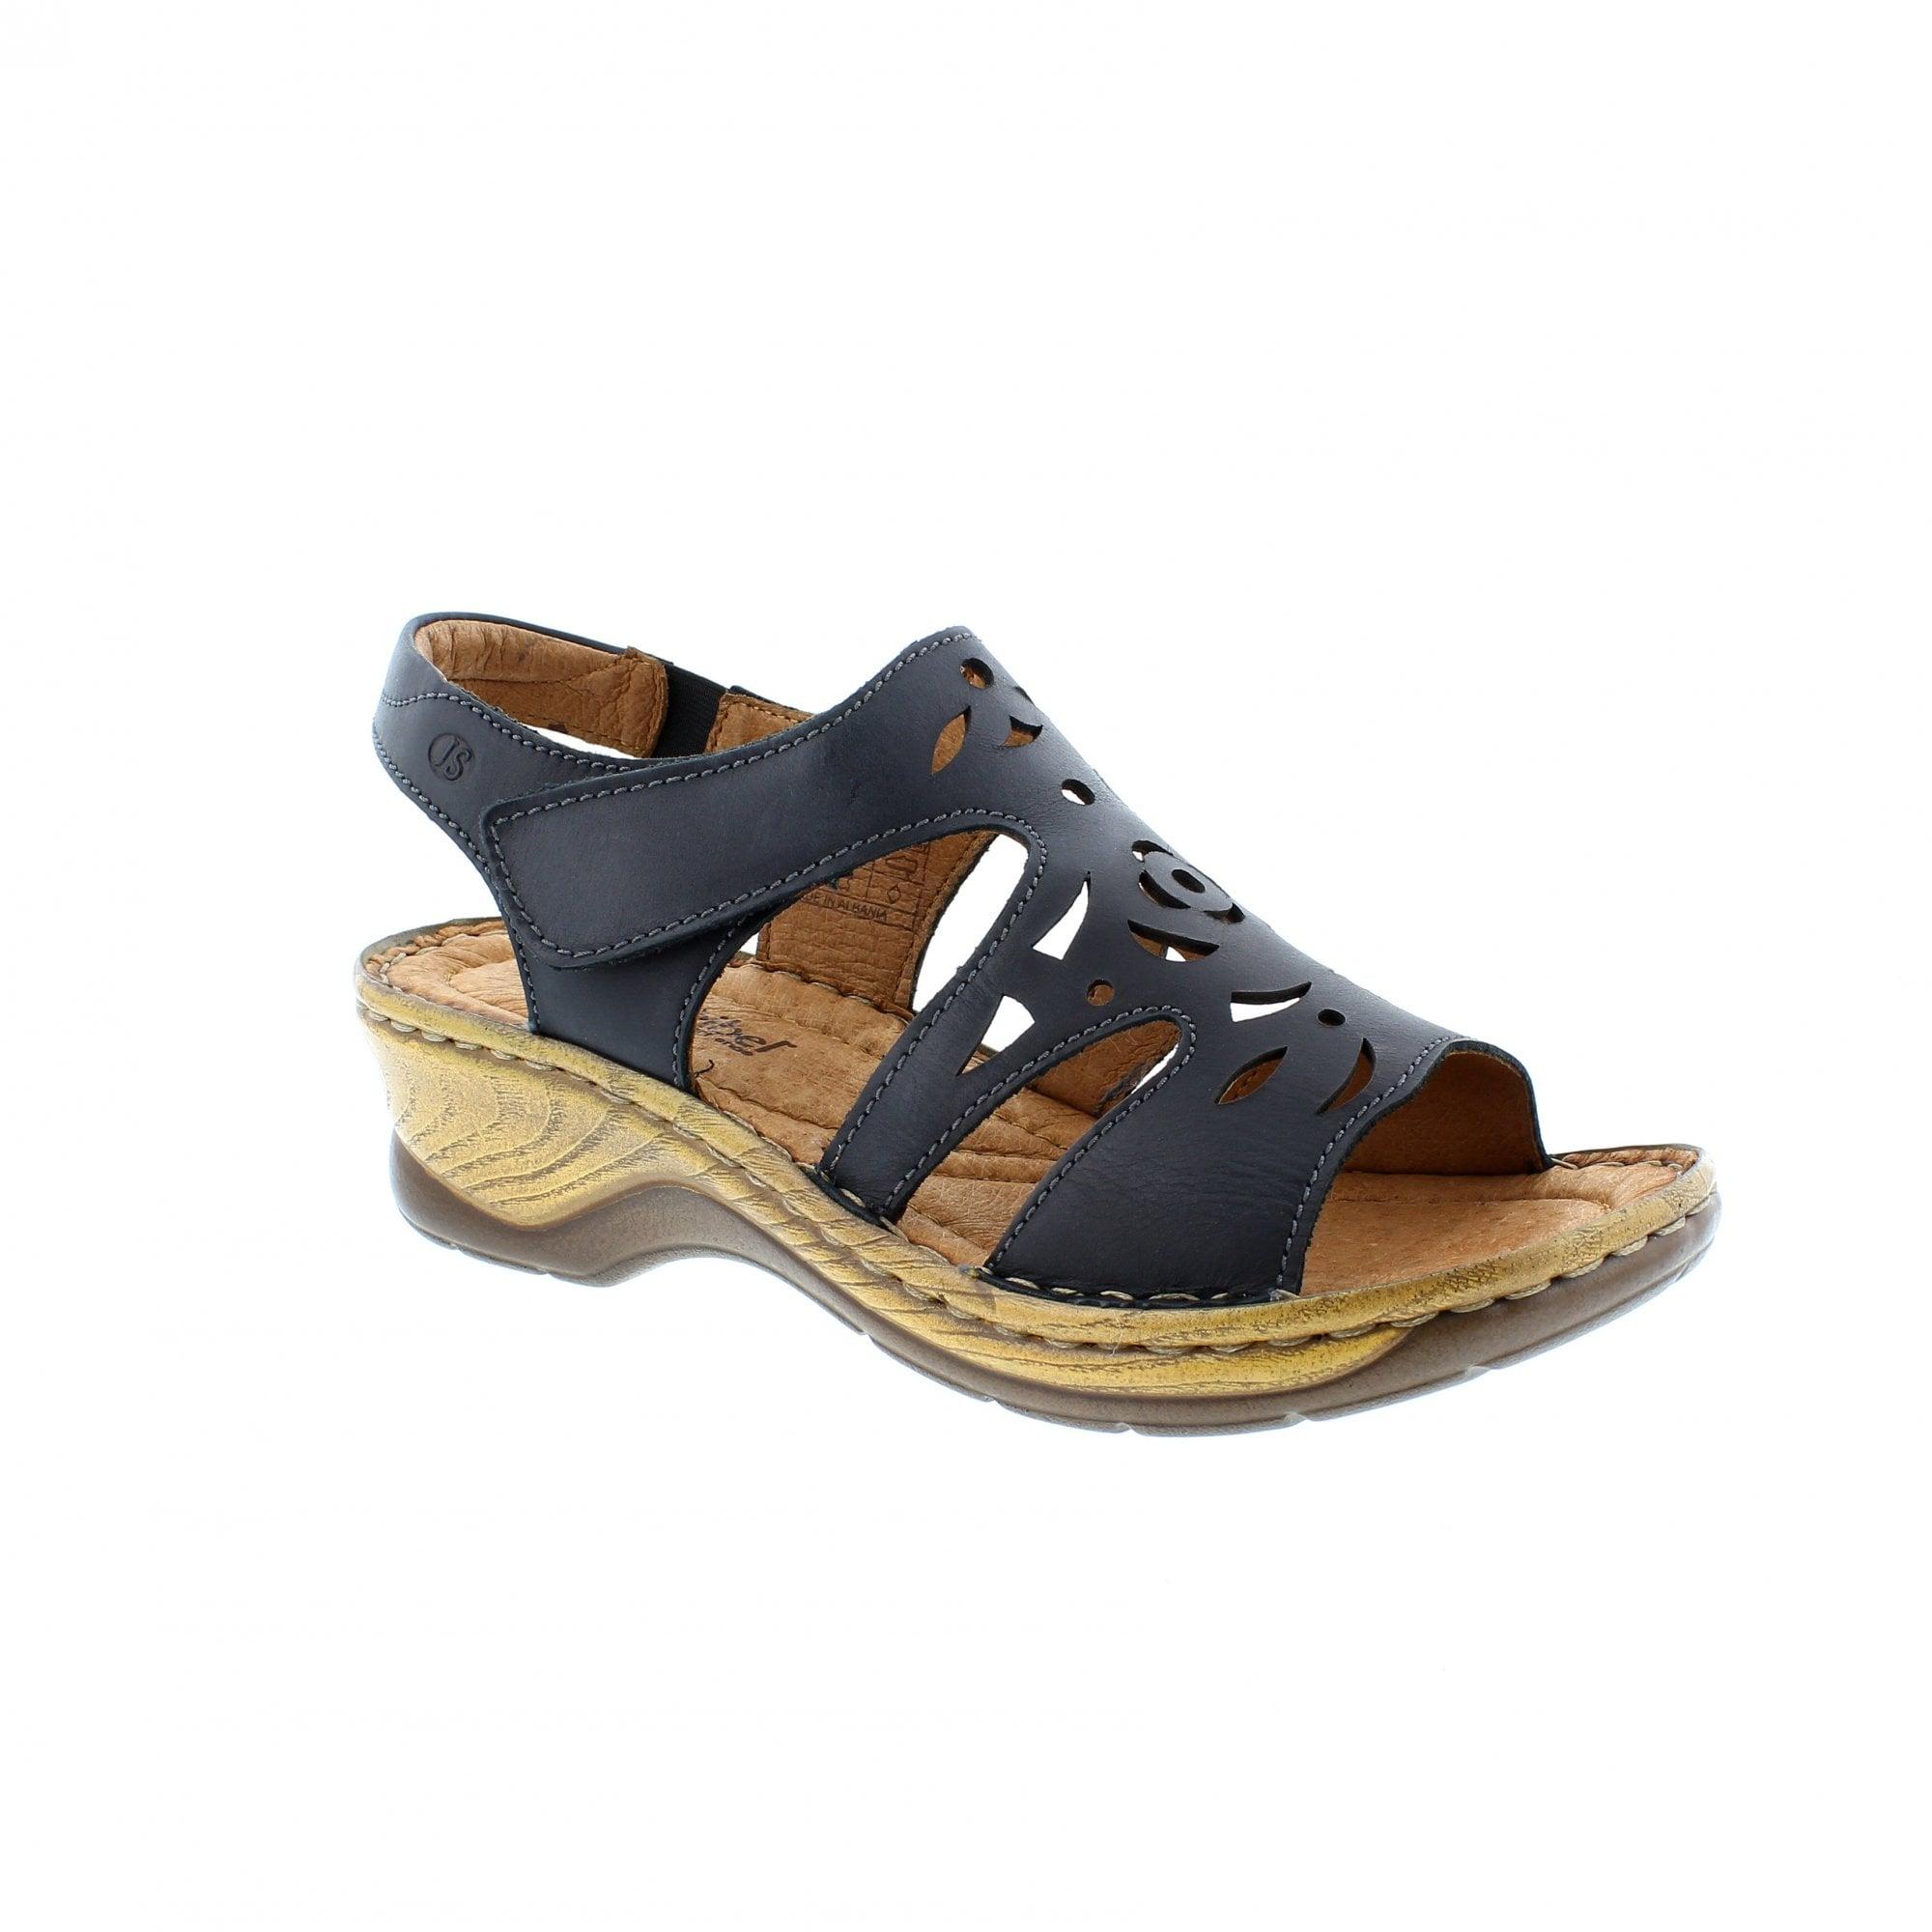 e8a8825db812f Josef Seibel Catalonia 56 56522-950100 Womens Sandals